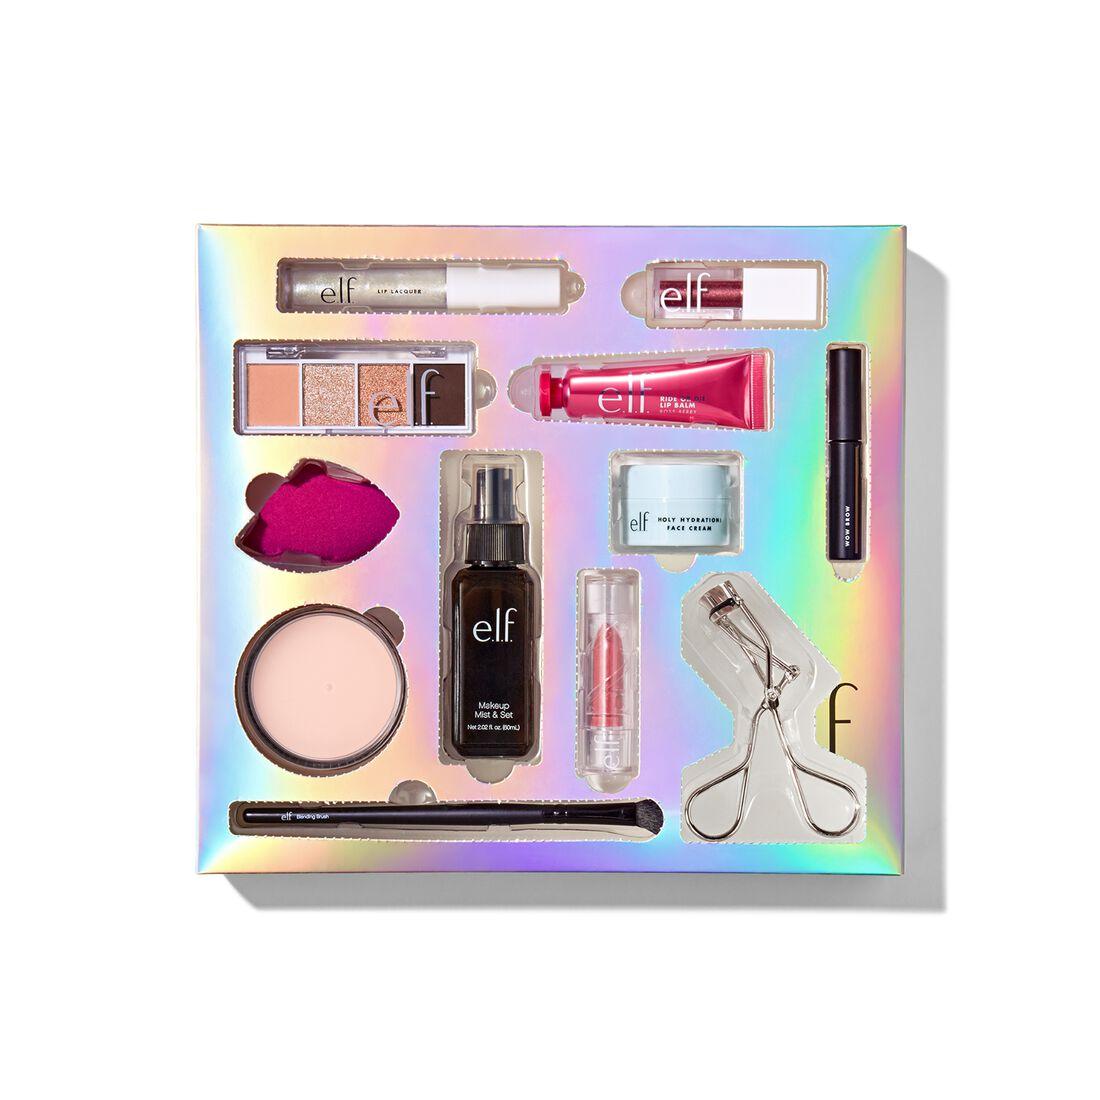 e.l.f. cosmetics 12 days of beauty advent calendar